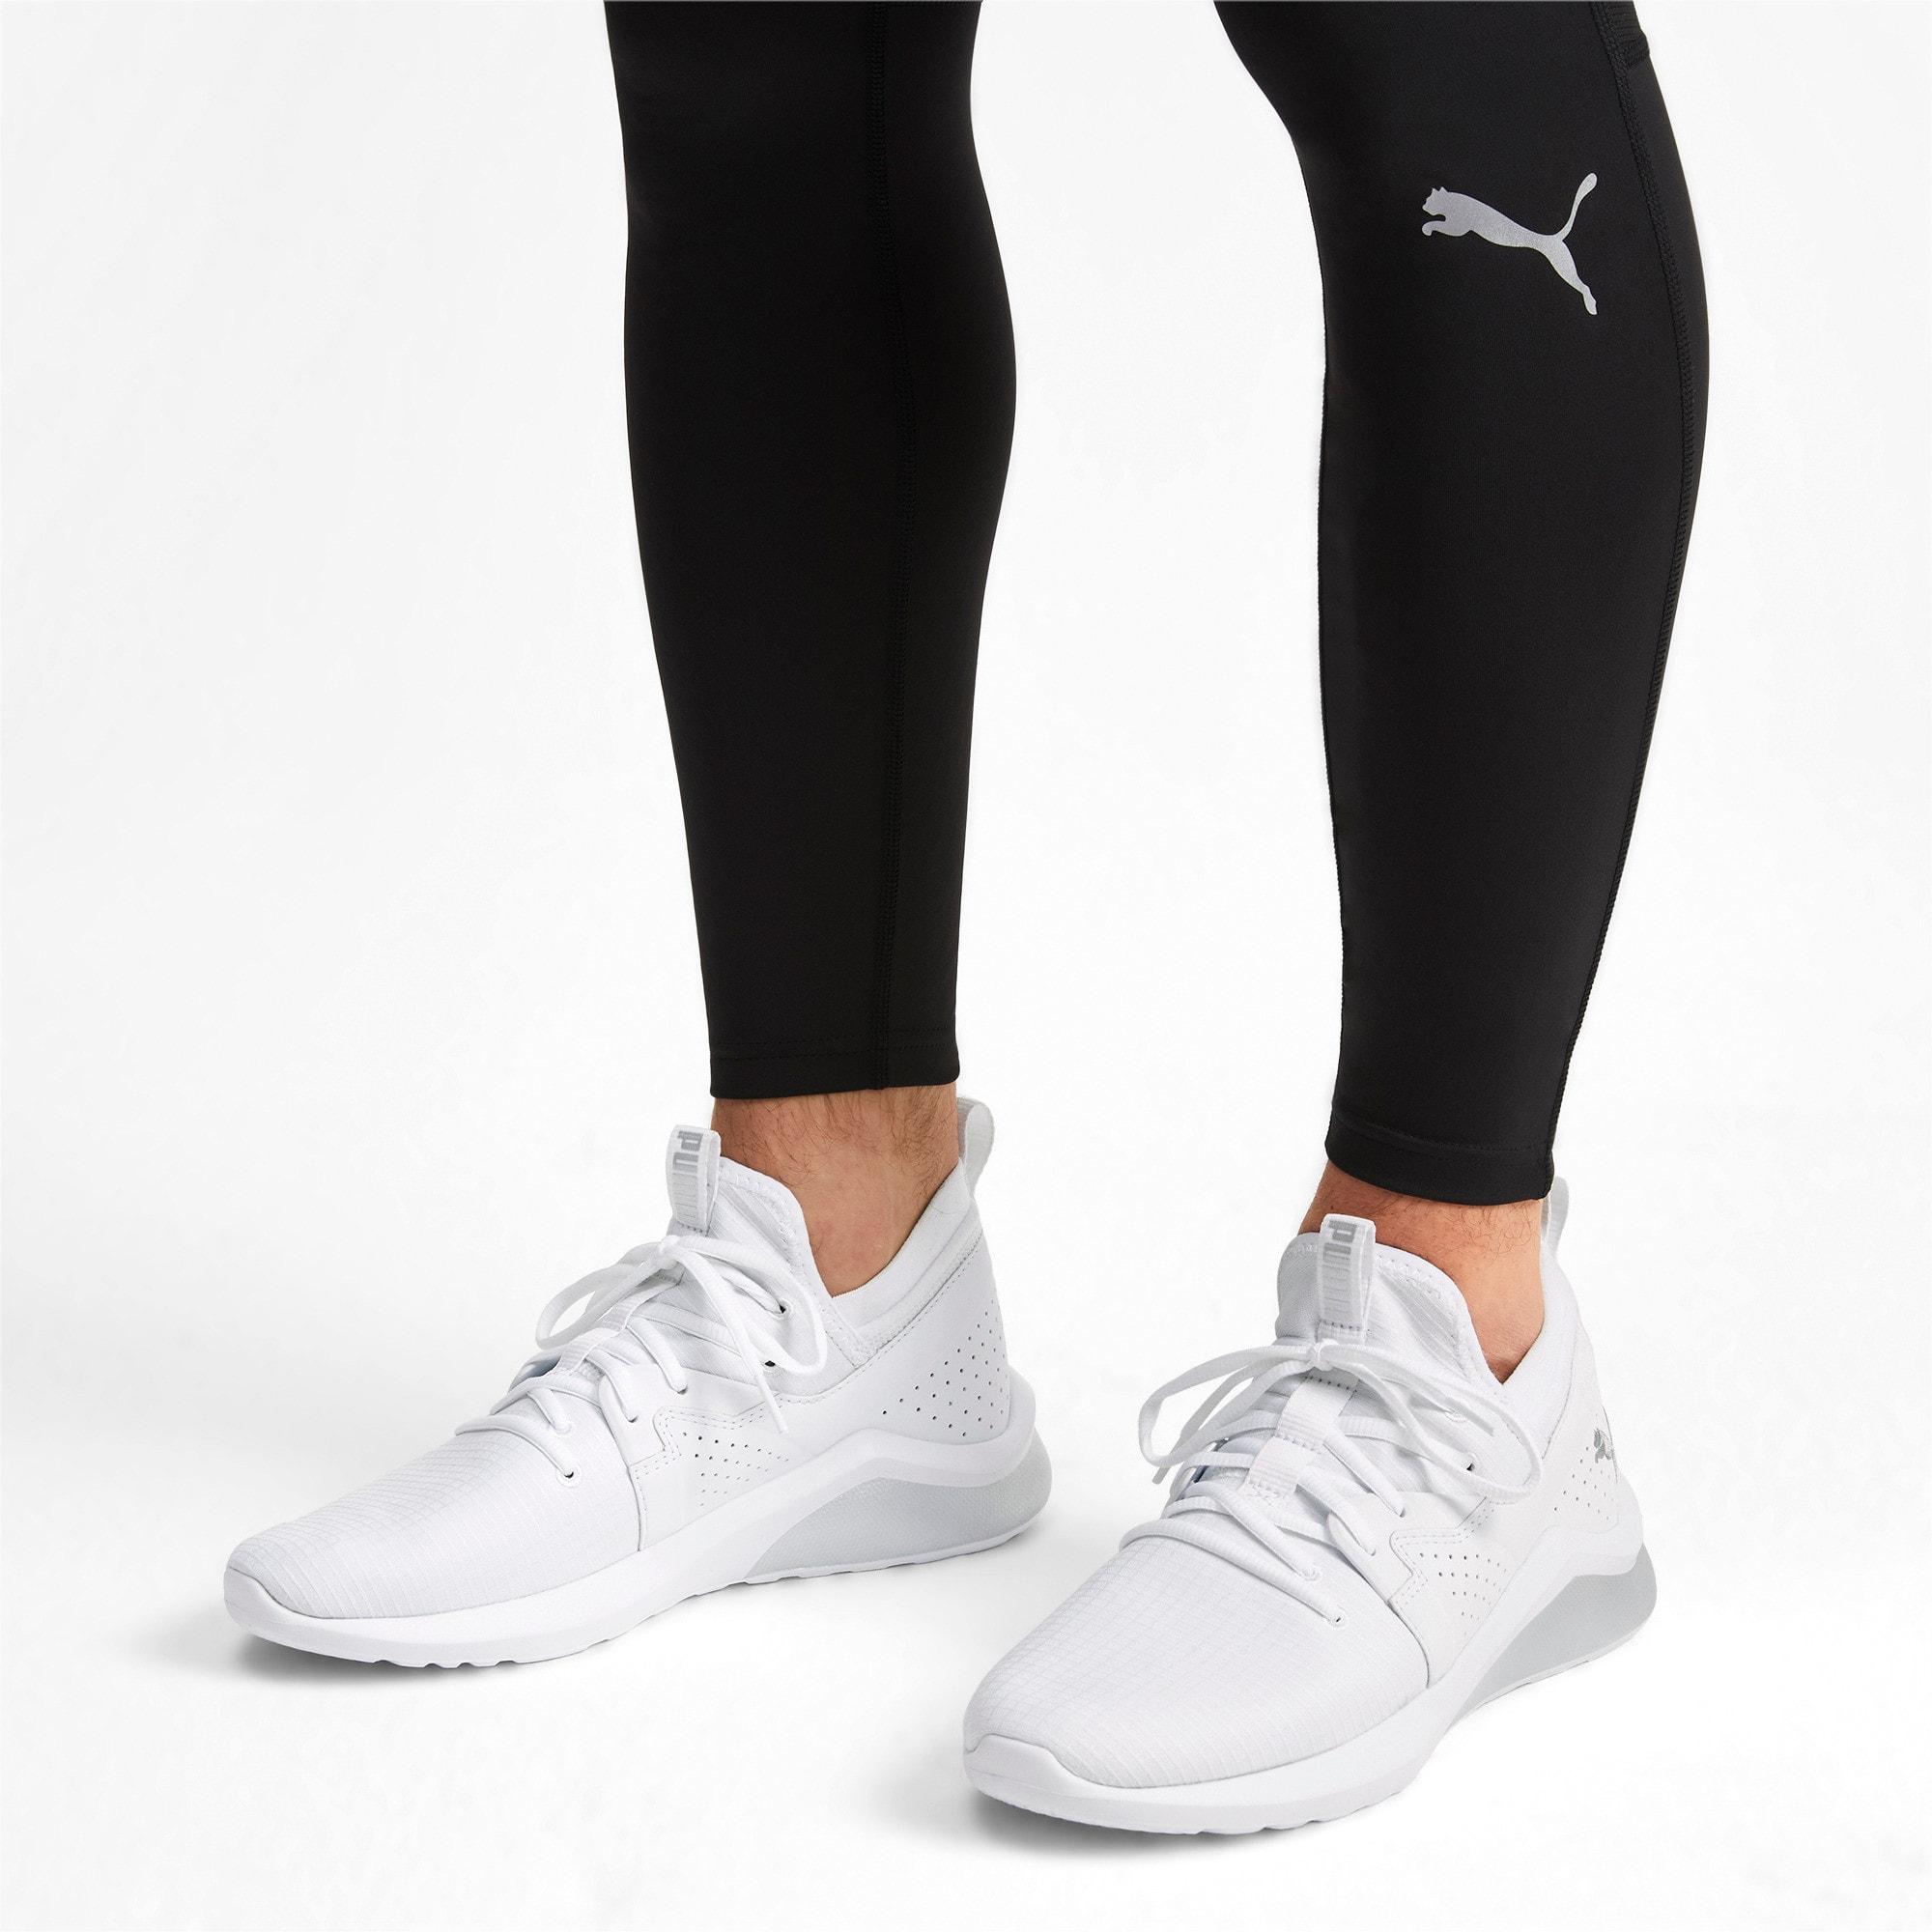 Thumbnail 2 of Emergence Lights Men's Running Shoes, Puma White-Puma Silver, medium-IND